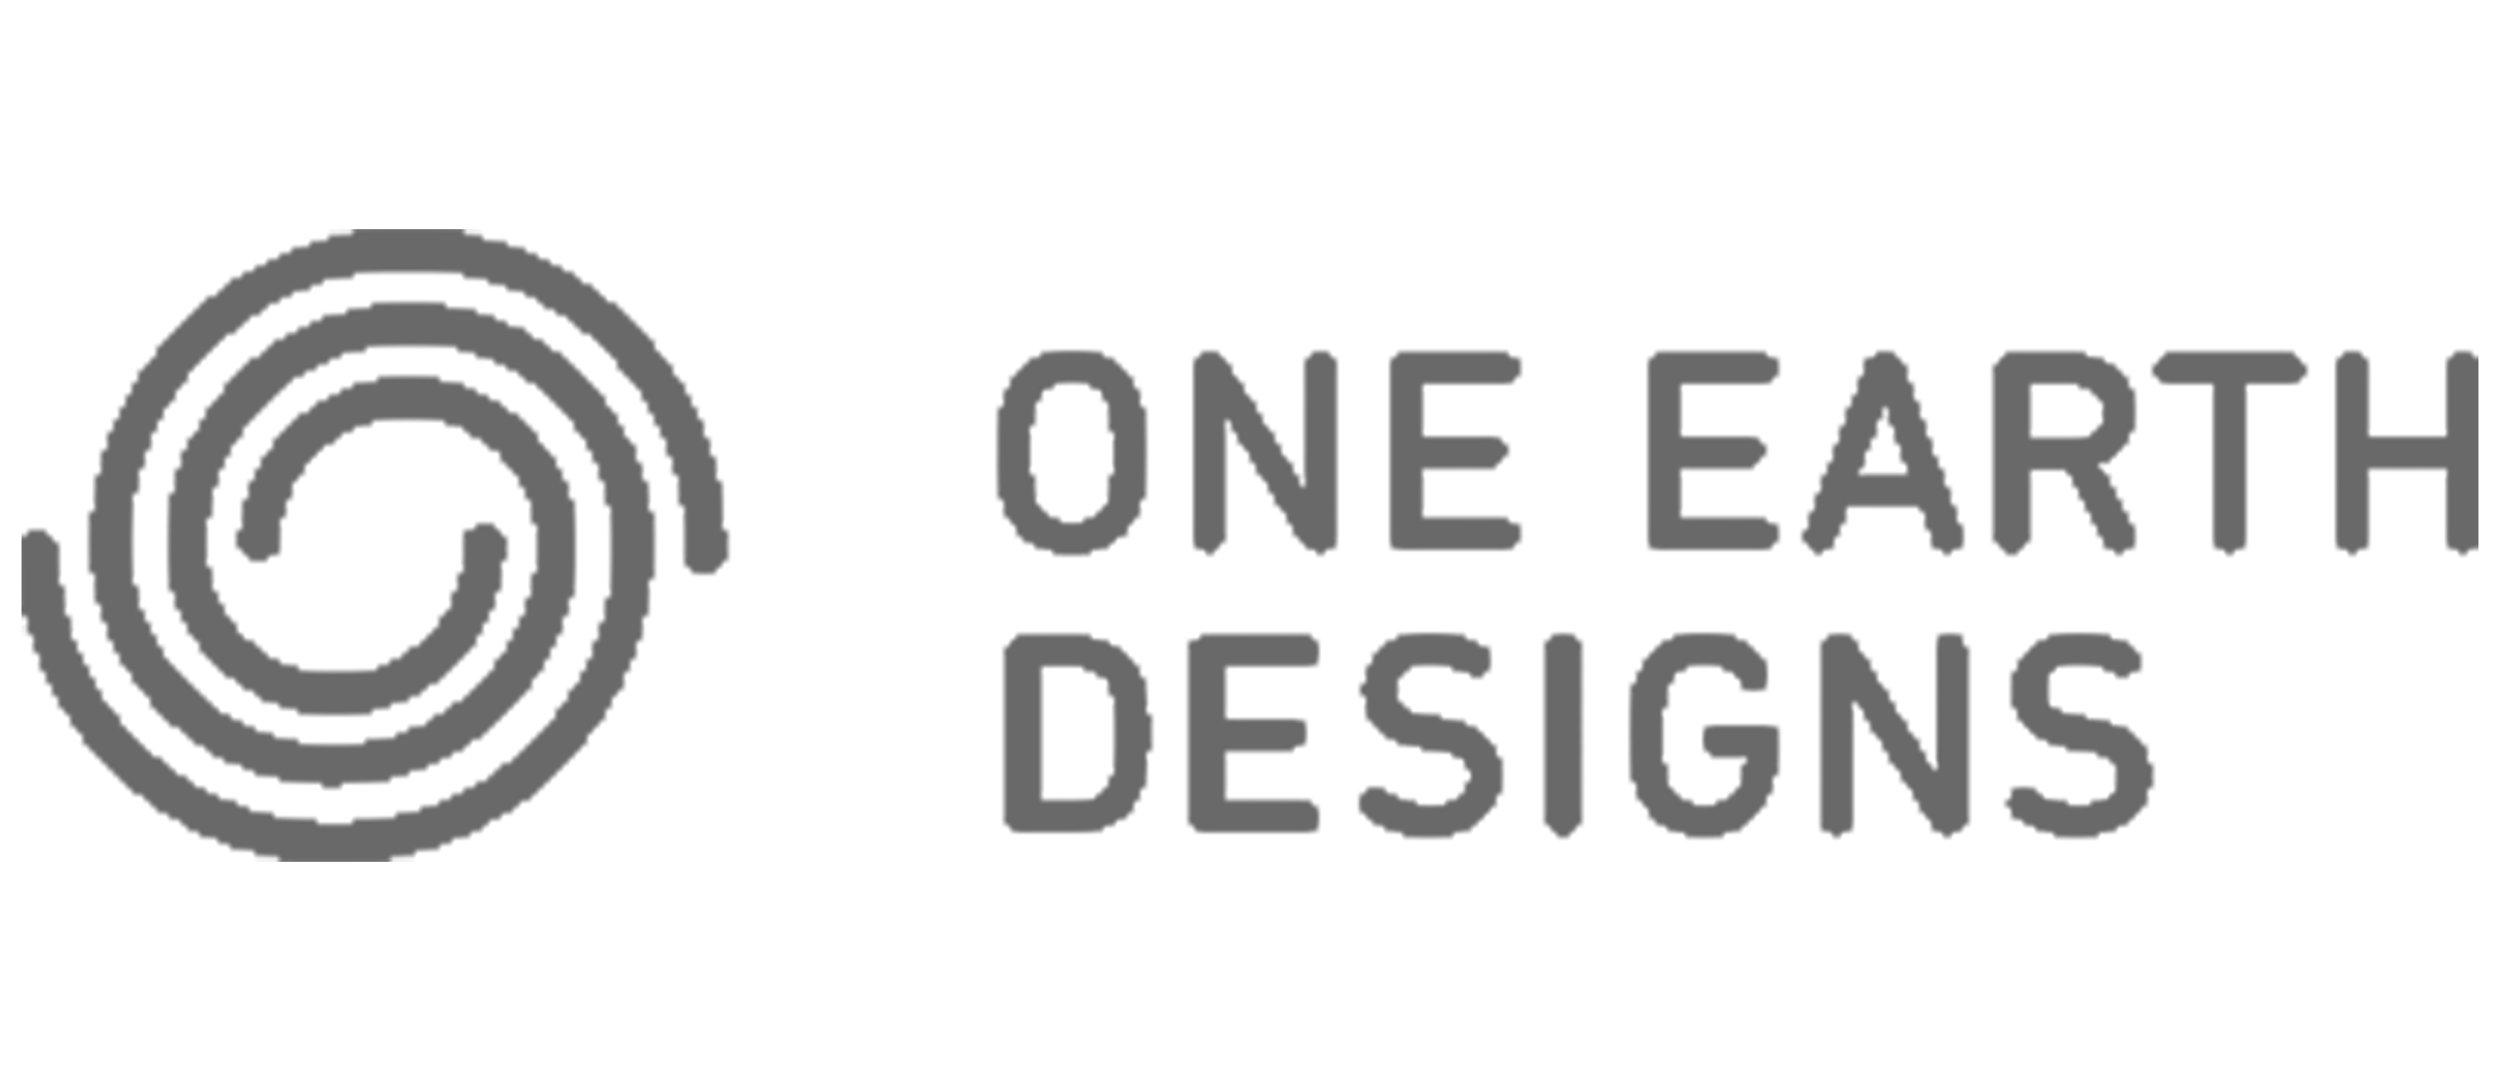 One Earth Design.jpg